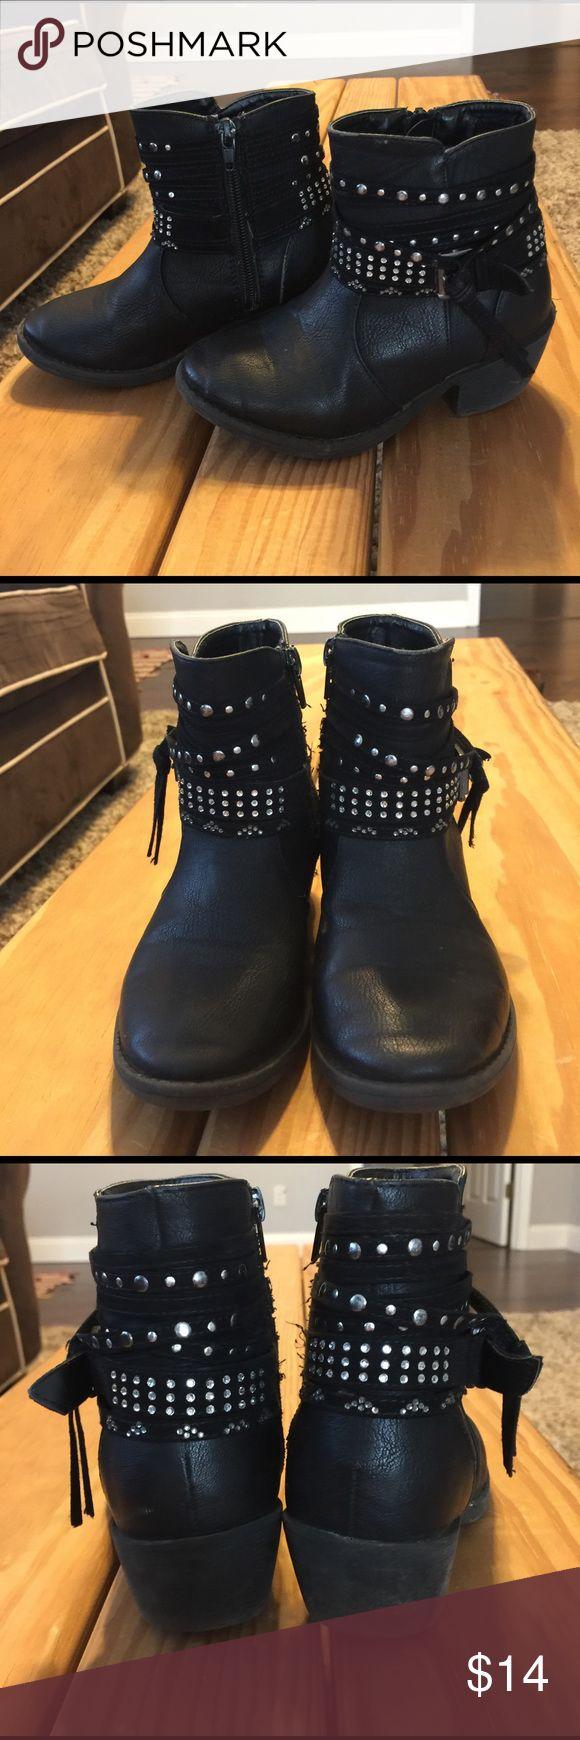 Girls black biker boots. Sz 12 💜 Cute. Lots. Very little wear. Great shape. Super cute. 🎀Bundle and save 20%🎀 Shoes Boots